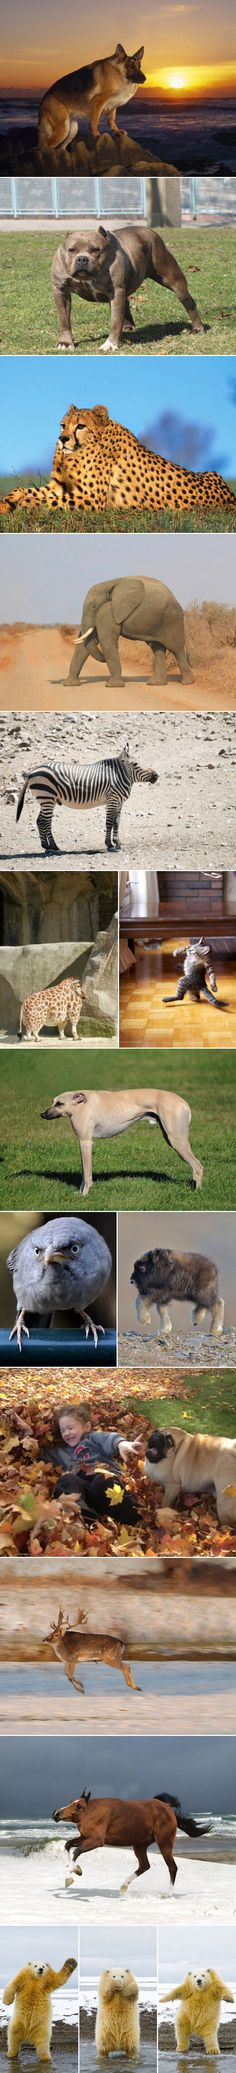 Animals minus necks